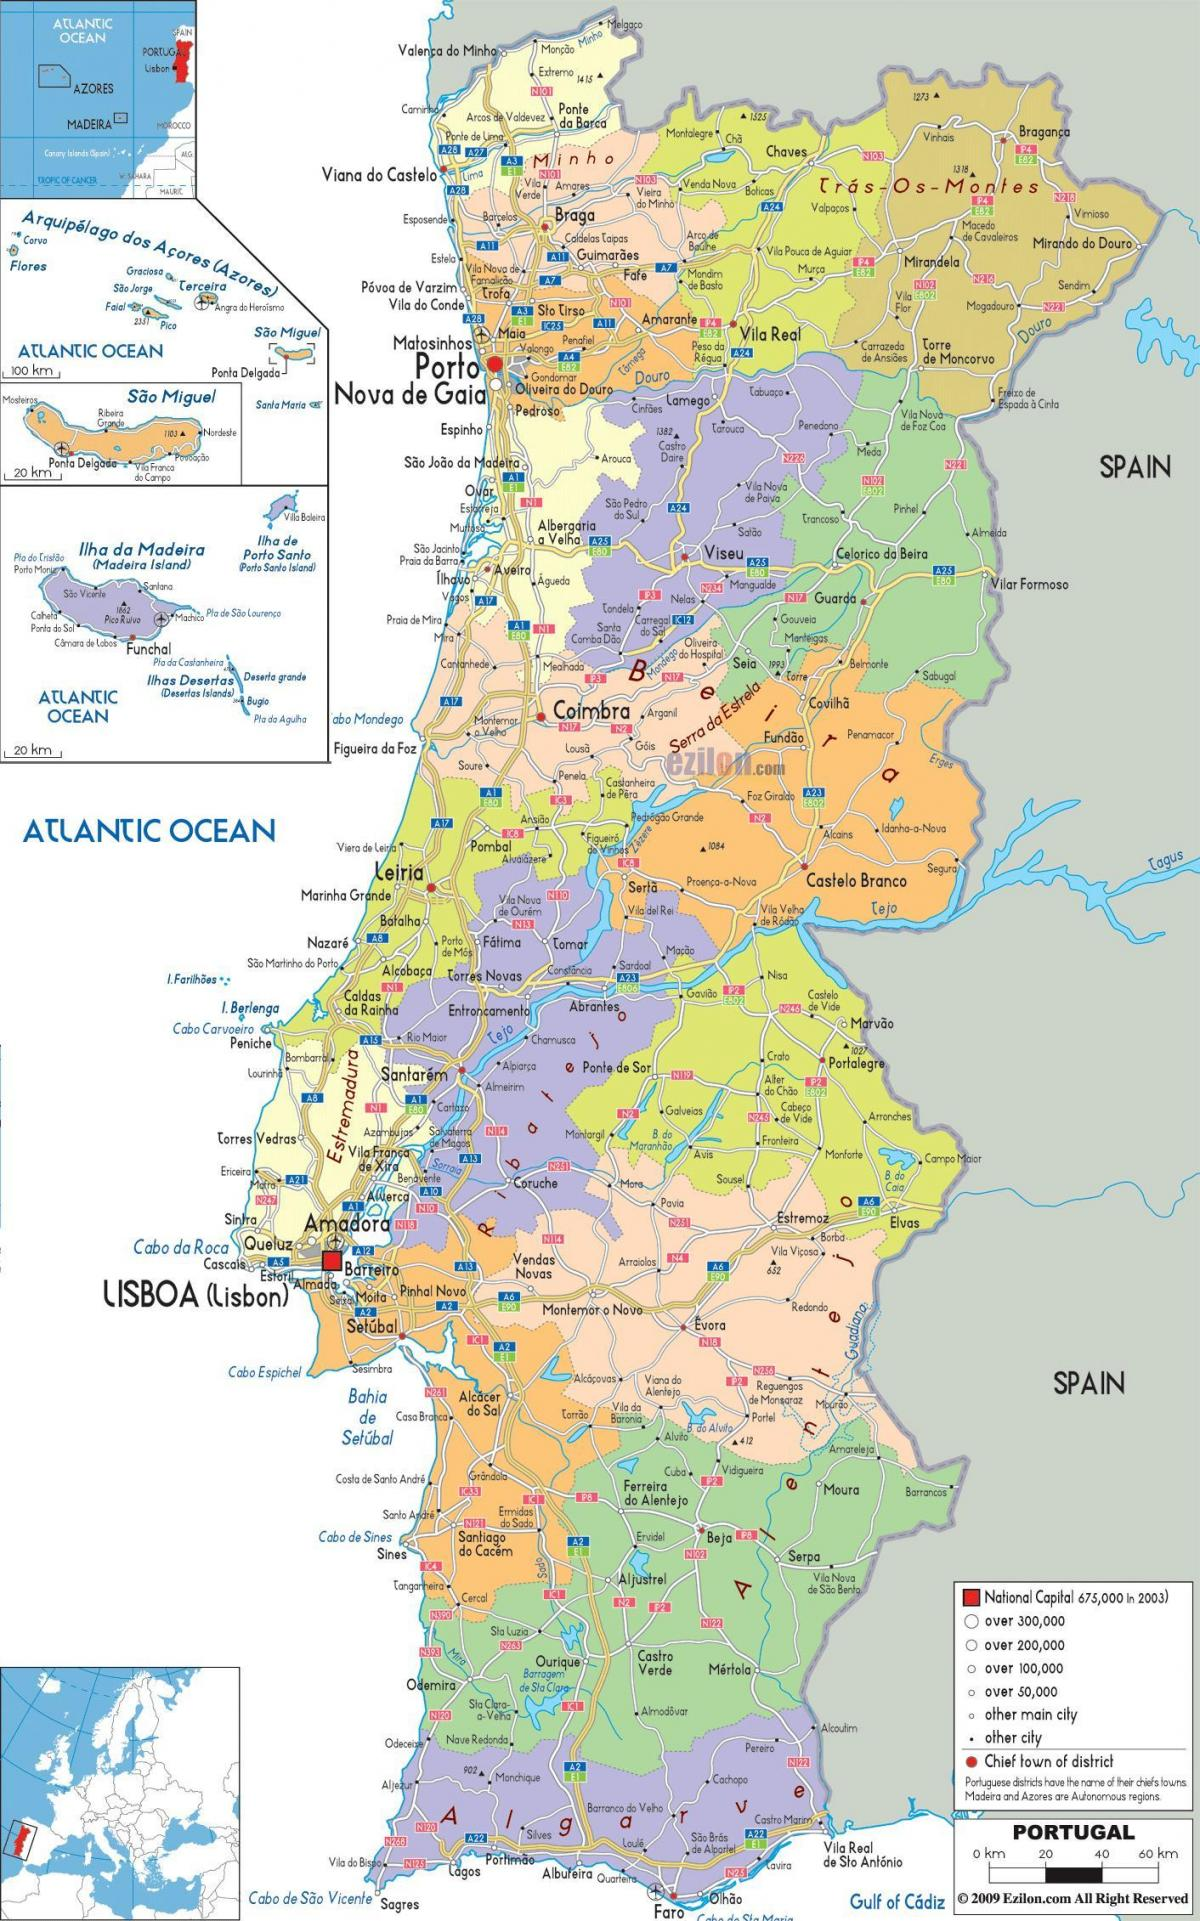 Karta Europa Portugal.Portugal Karta Med Stader Karta Over Portugal Med Stader Sodra